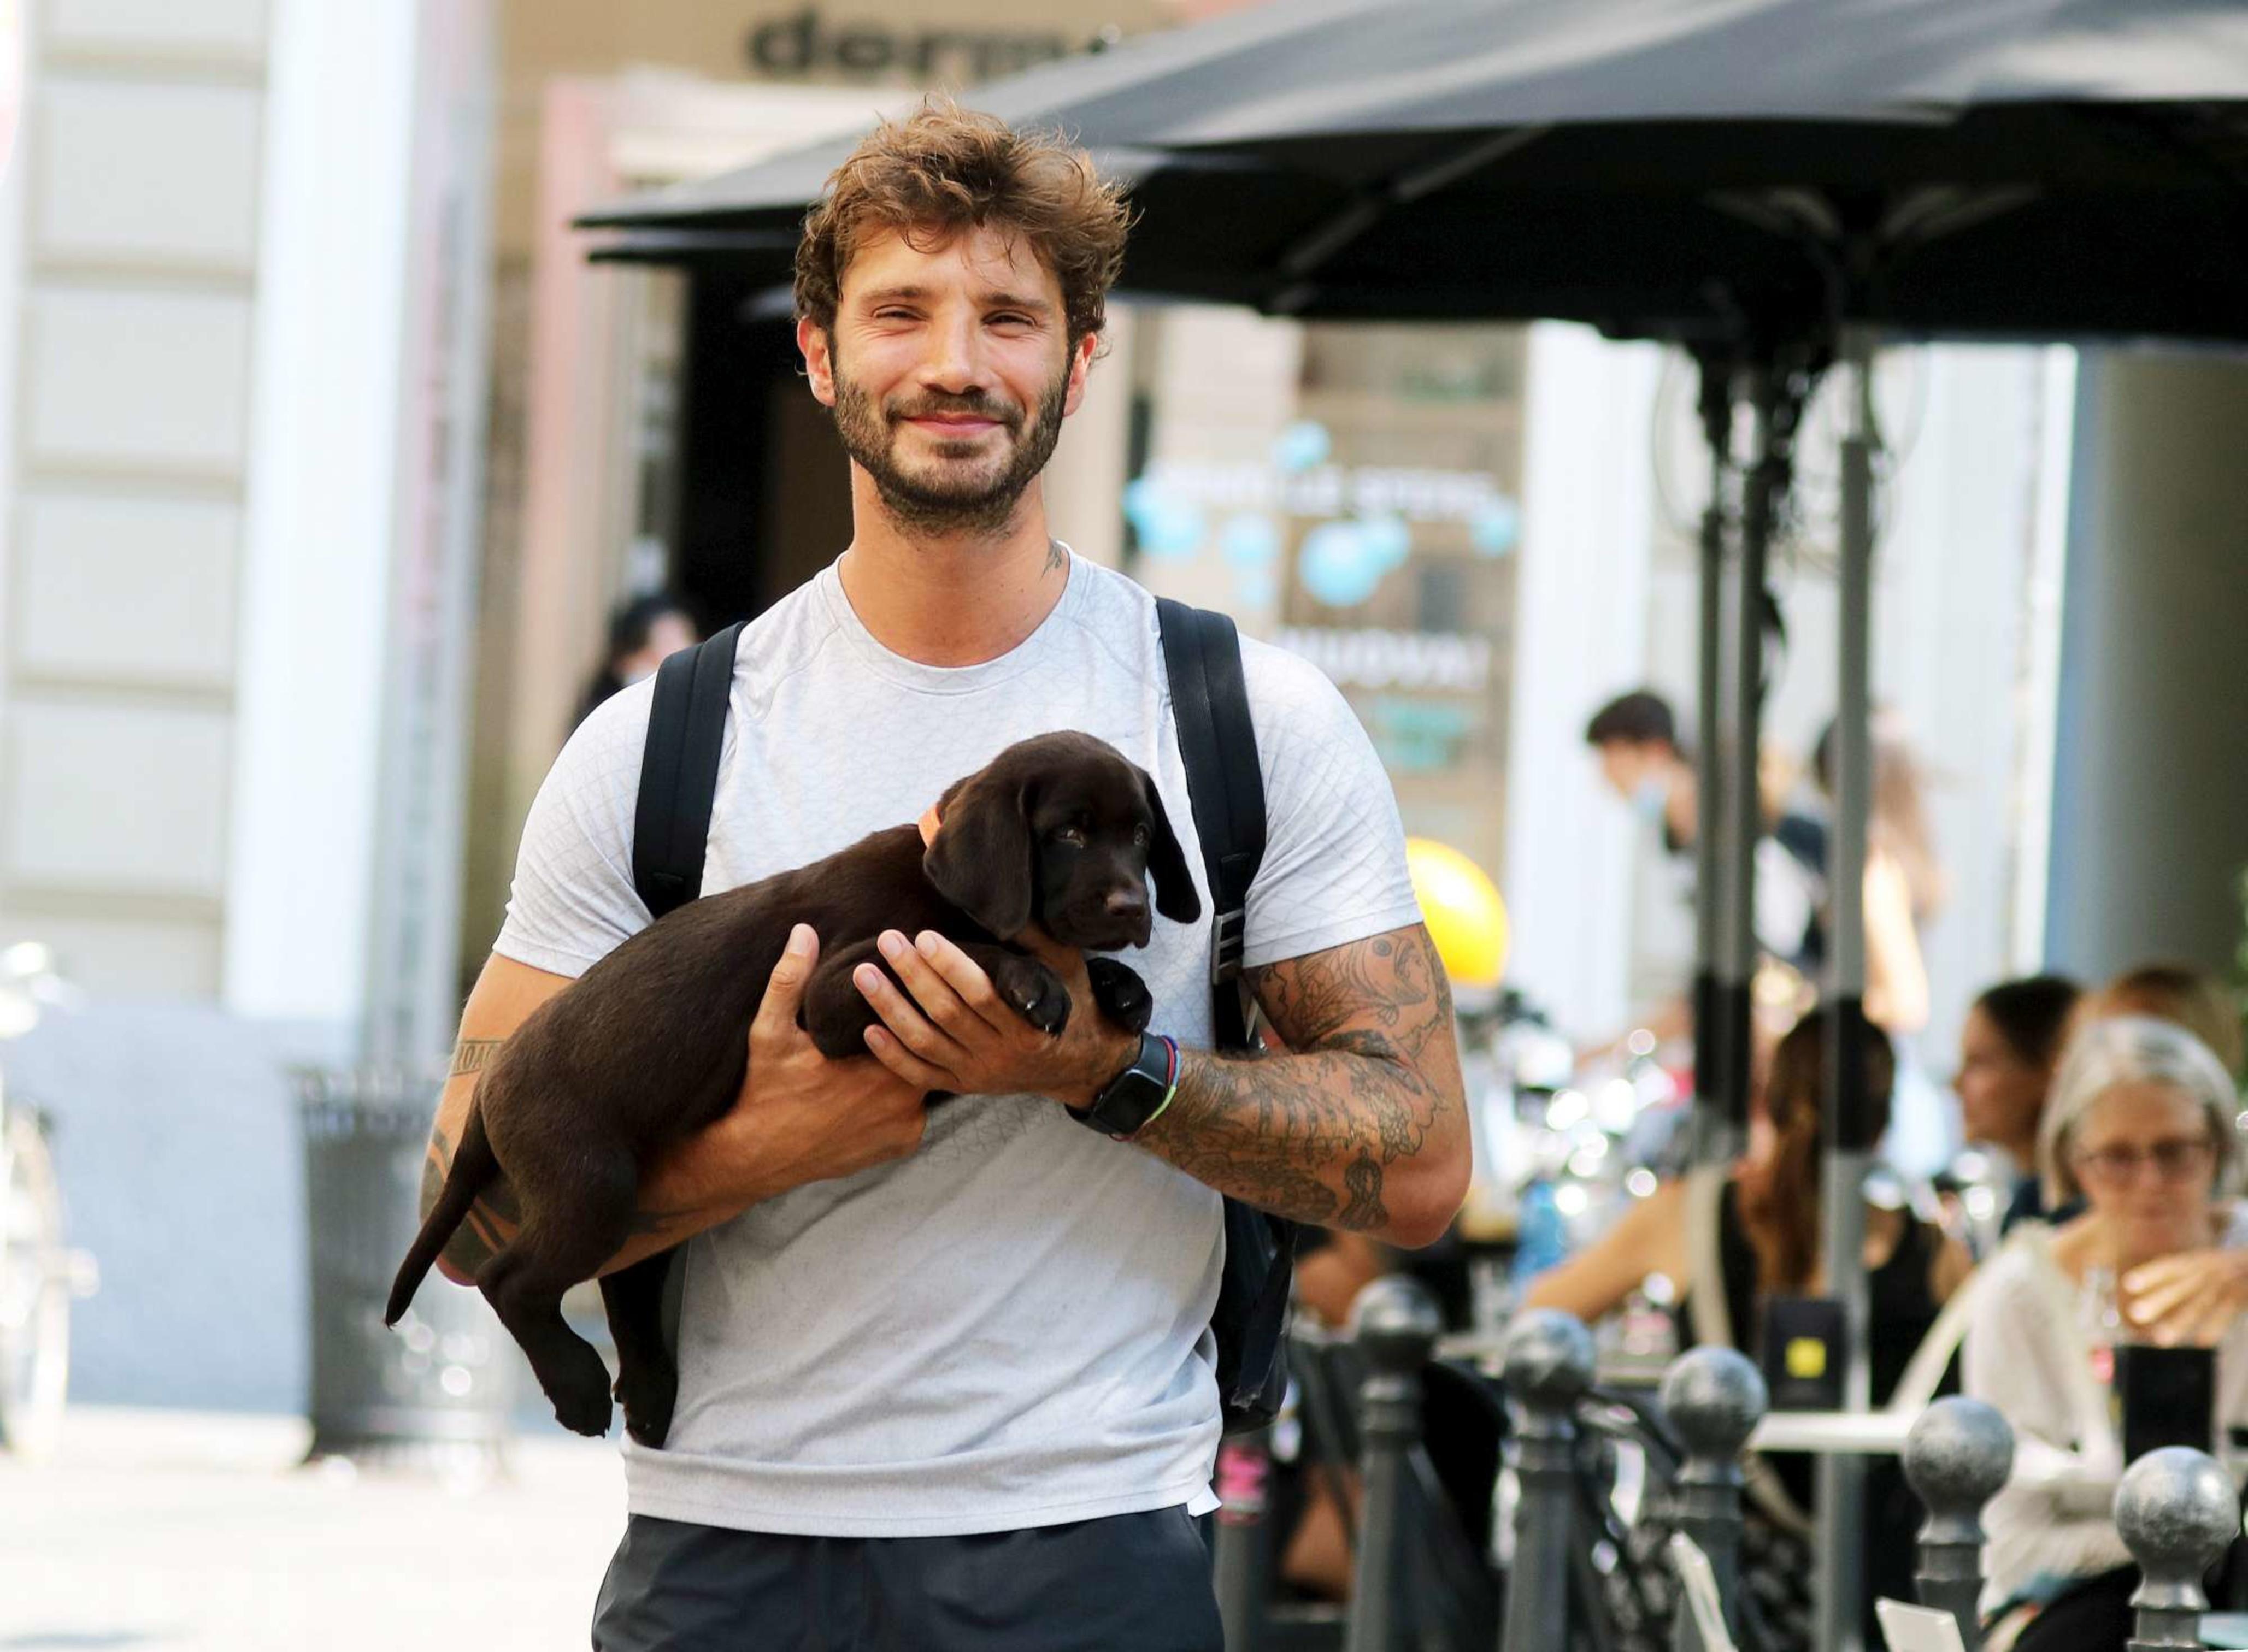 Stefano De Martino ha comprato un cagnolino per Santiago